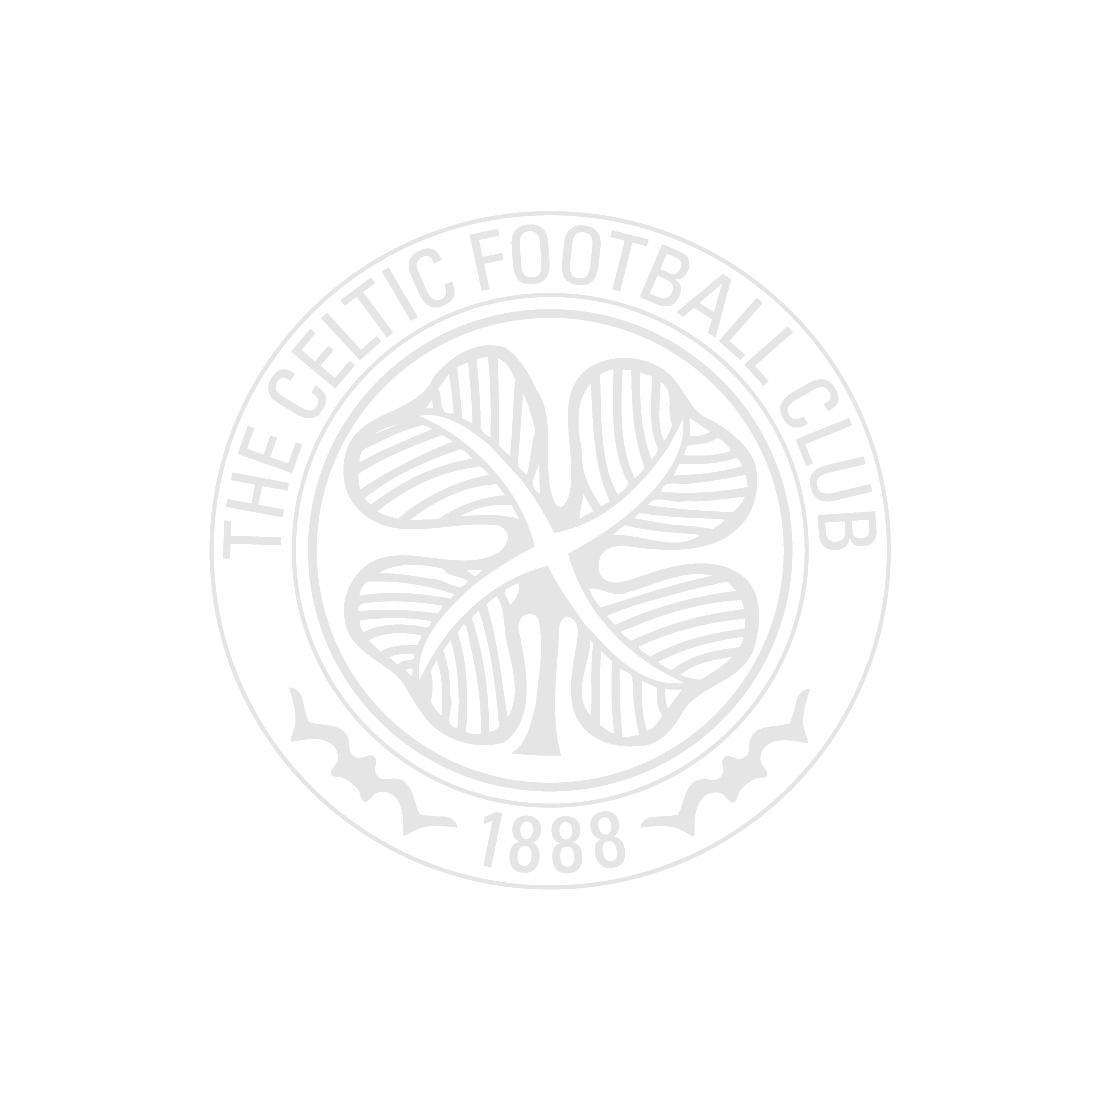 Celtic 1988 Centenary Retro Away Kit Mug